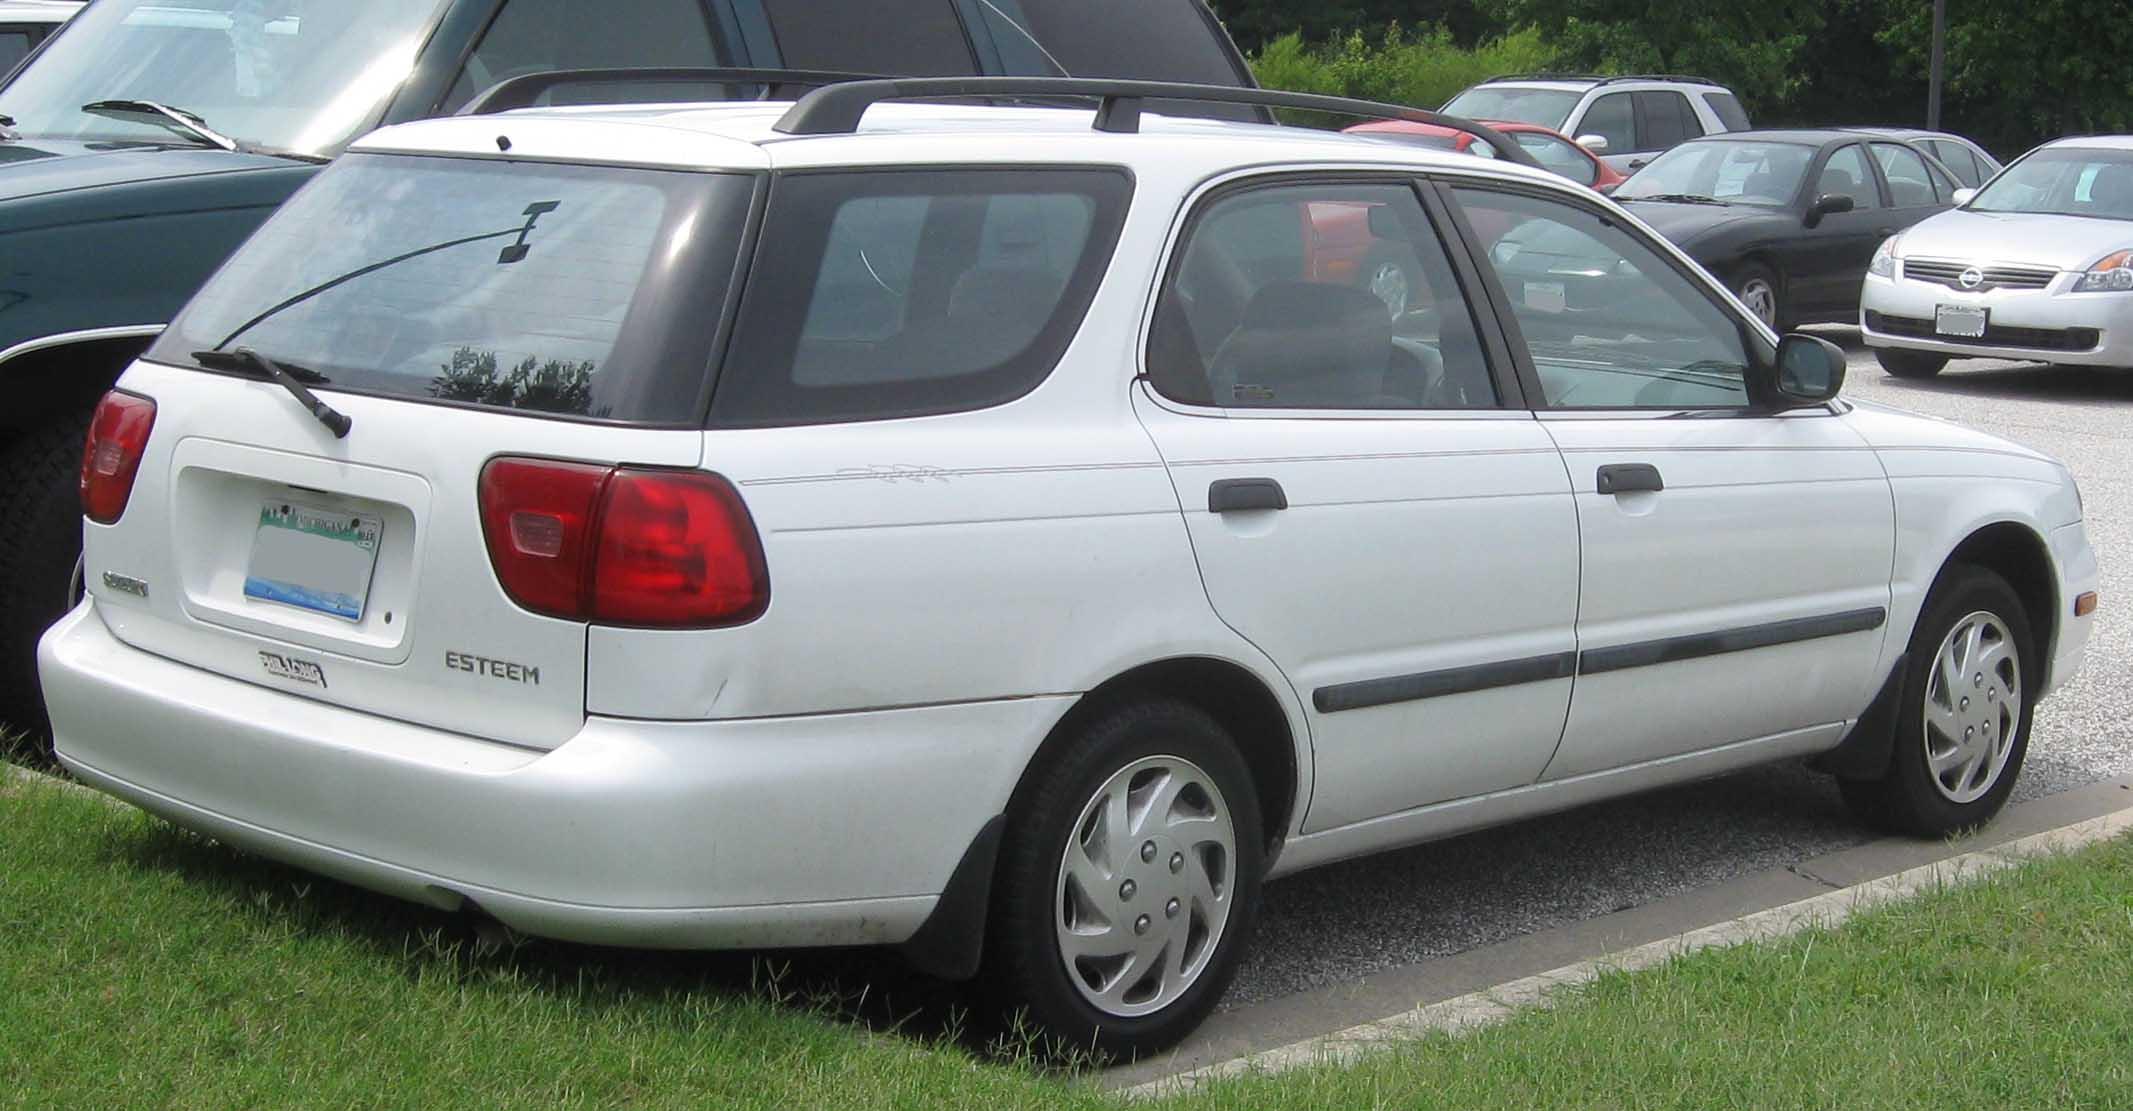 File:99-02 Suzuki Esteem wagon rear.jpg - Wikimedia Commons